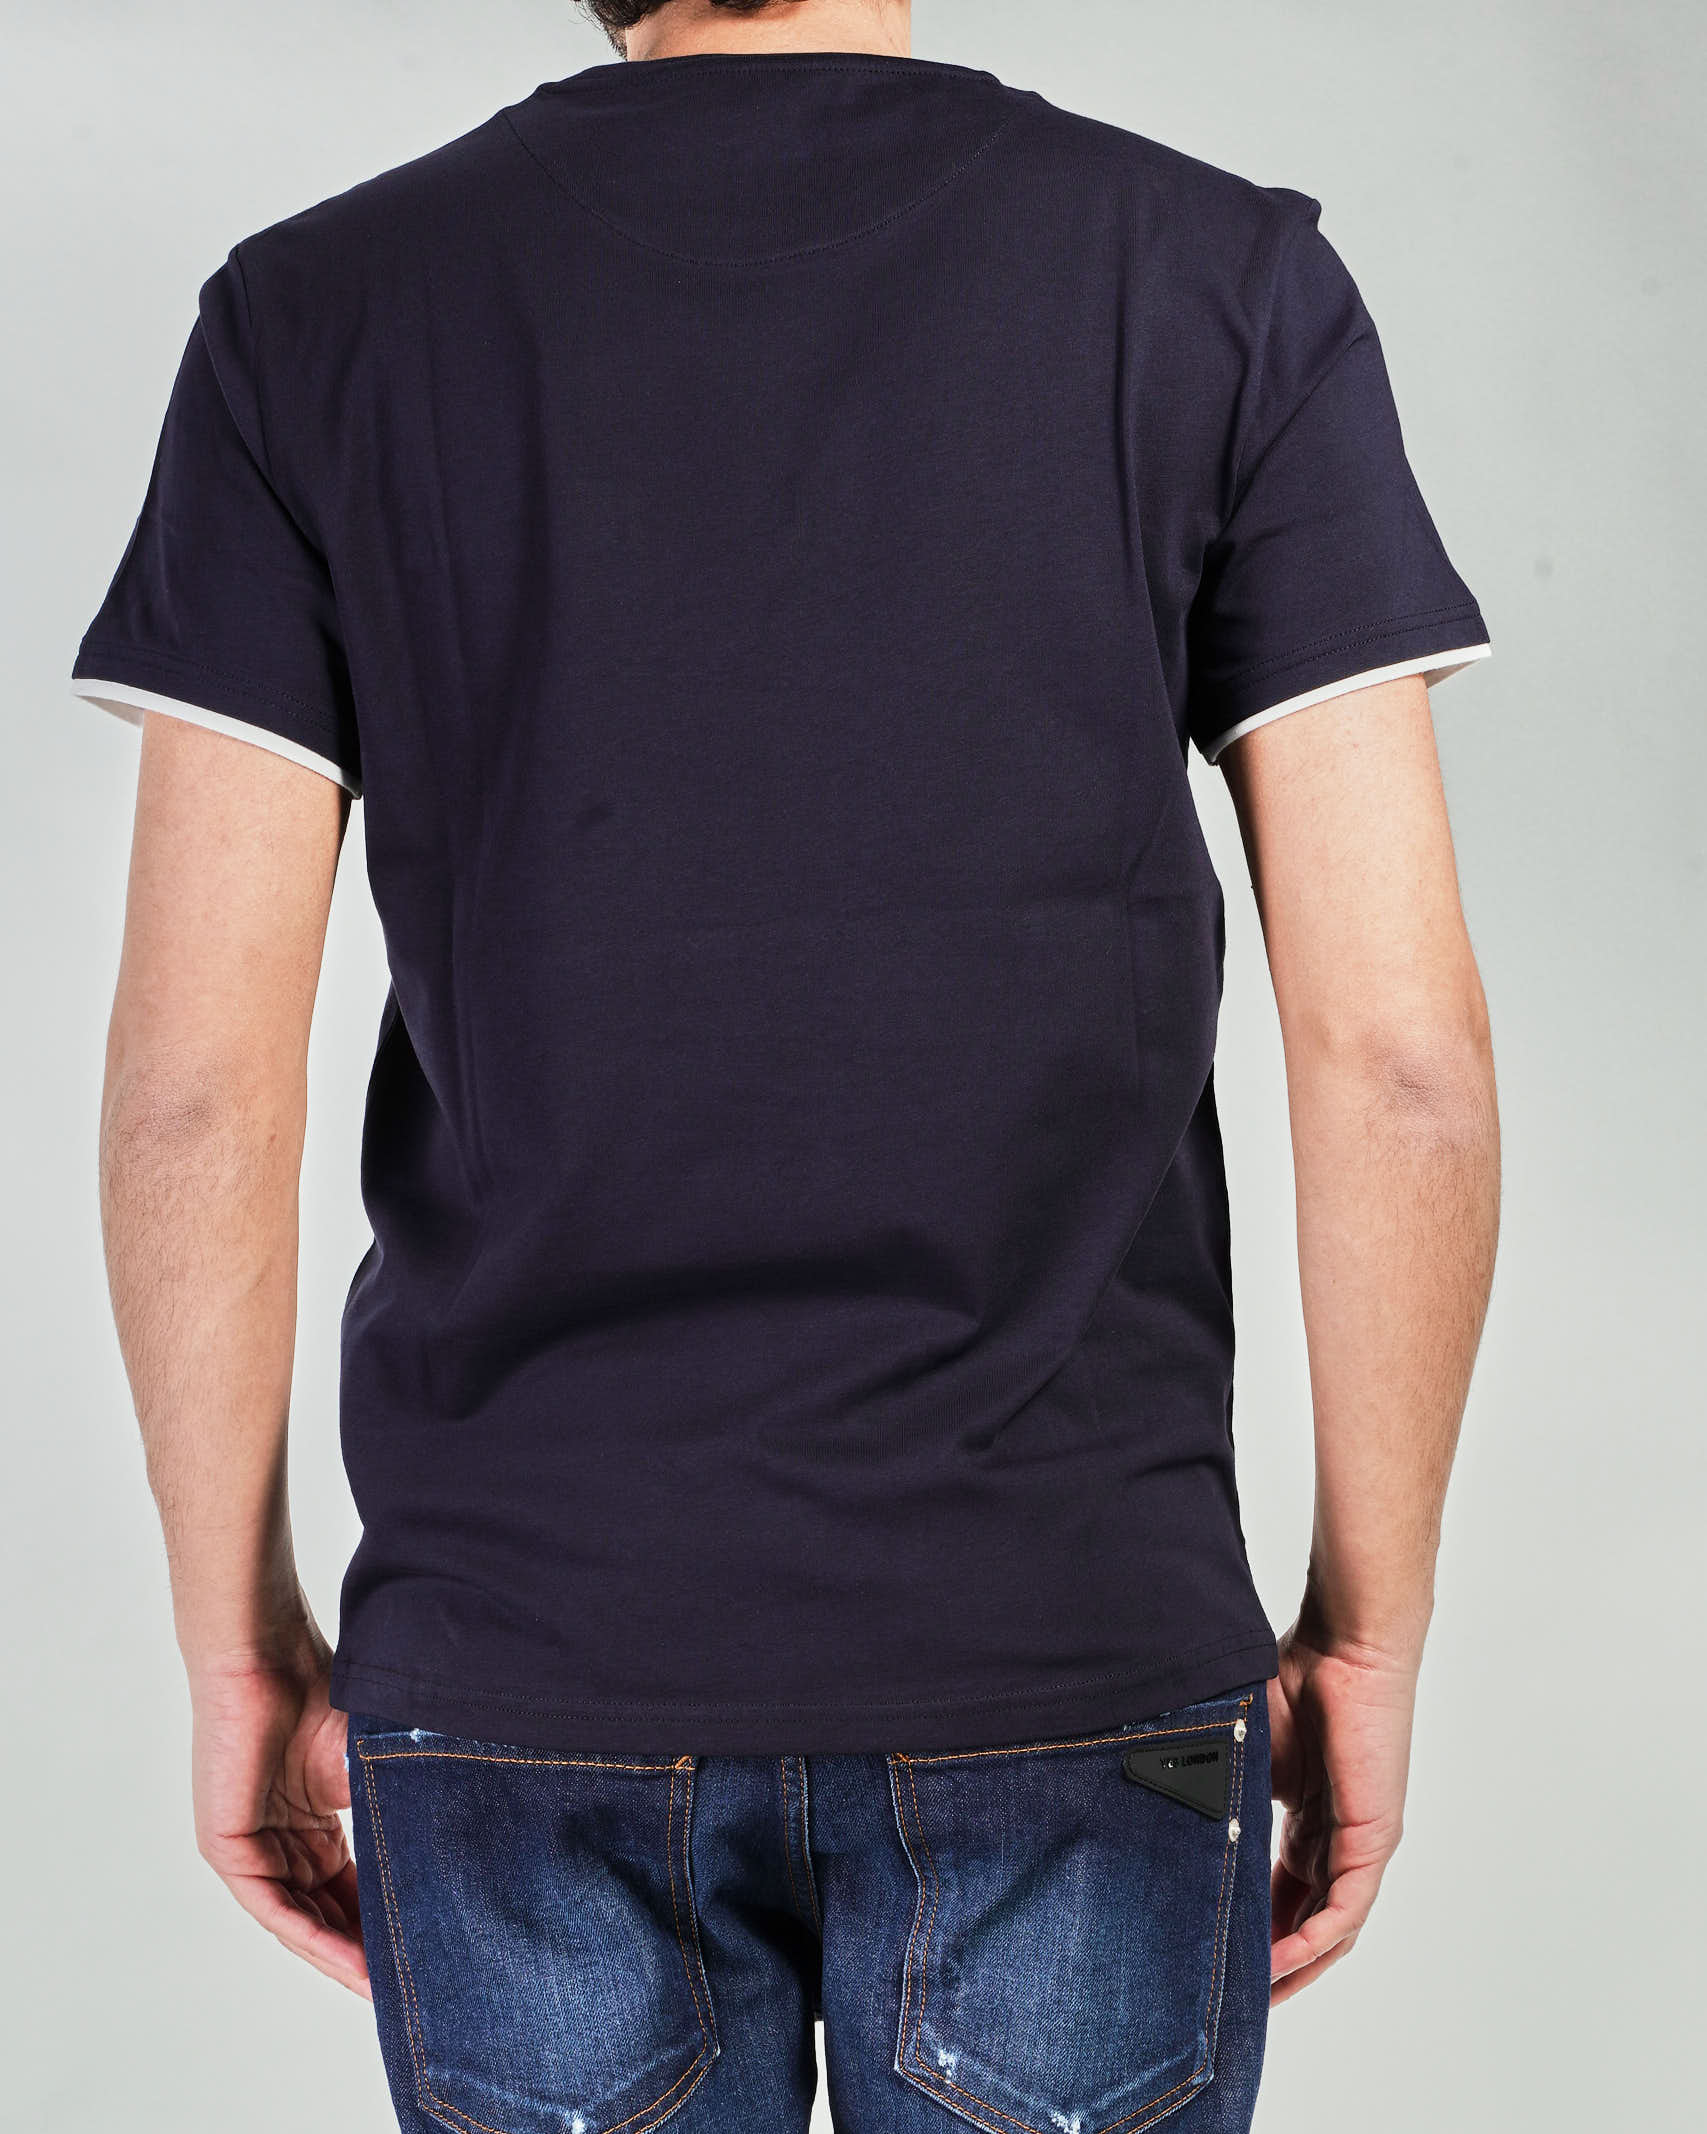 T-shirt con profili a contrasto Manuel Ritz MANUEL RITZ   T-shirt   3032M55121329389